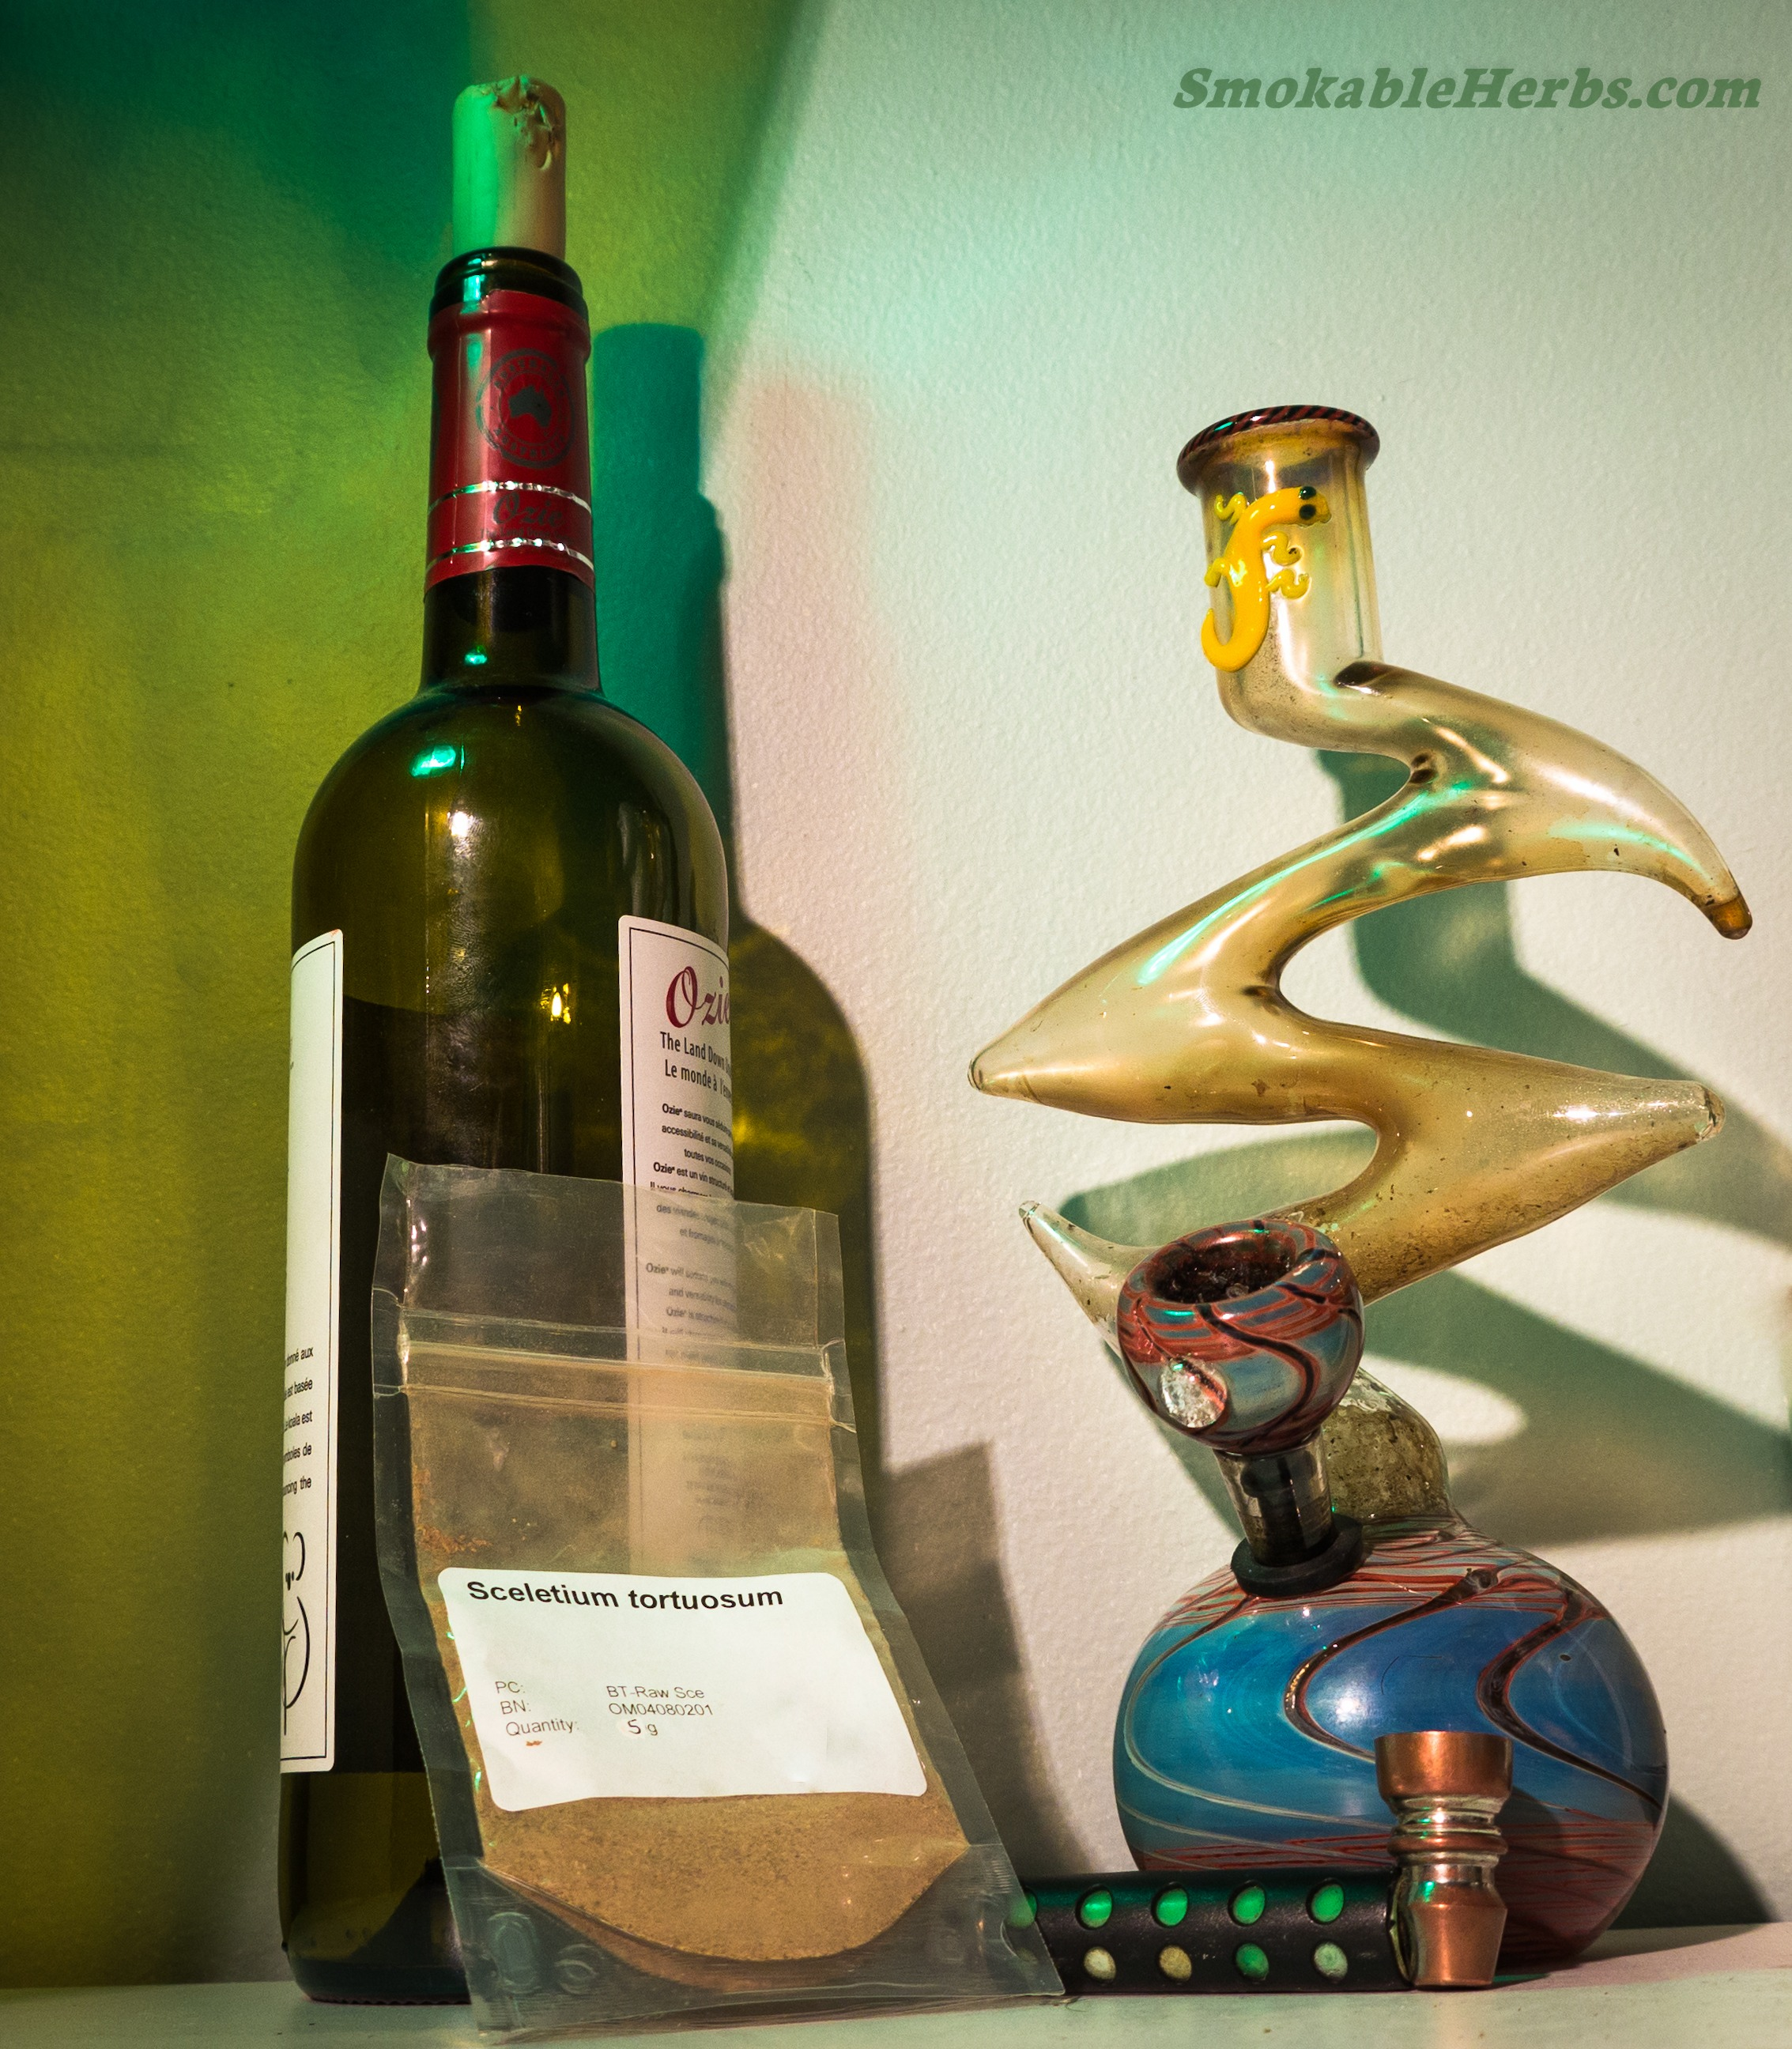 Kanna Herb: Effects & Benefits - Smokable Herbs